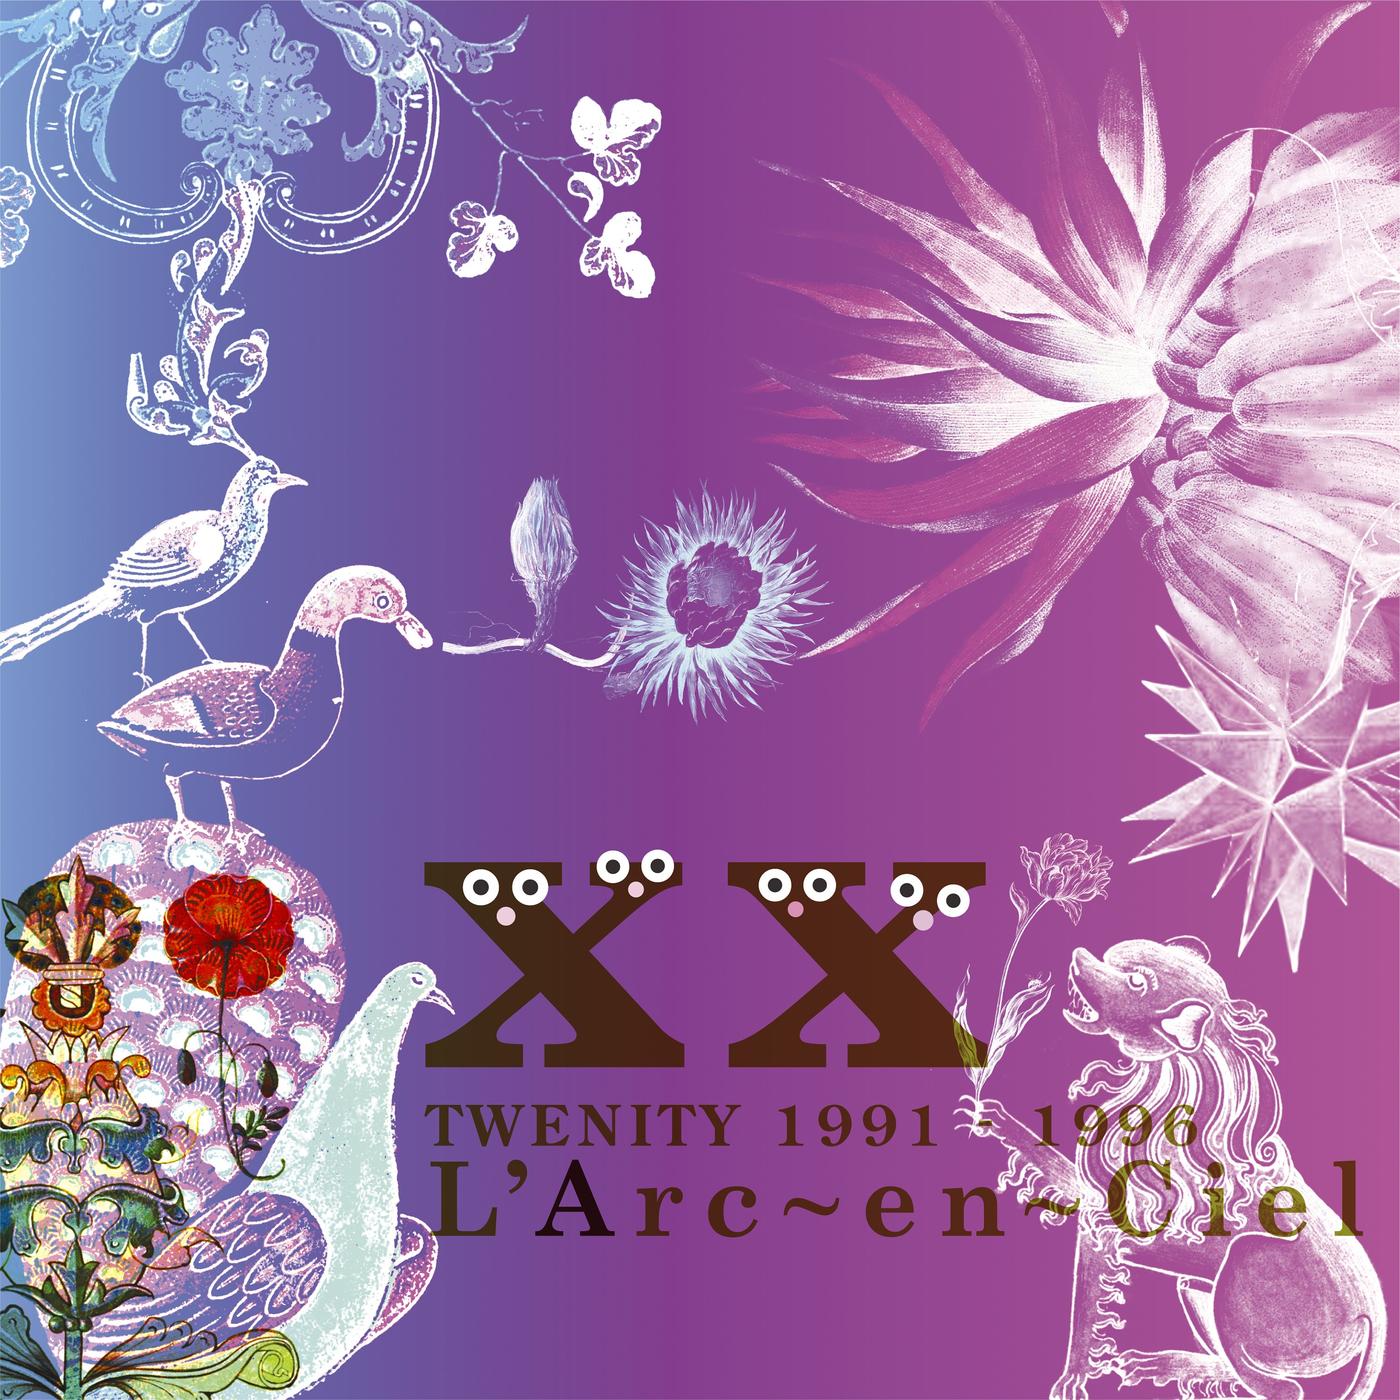 TWENITY 1991-1996 - L'Arc-en-Ciel